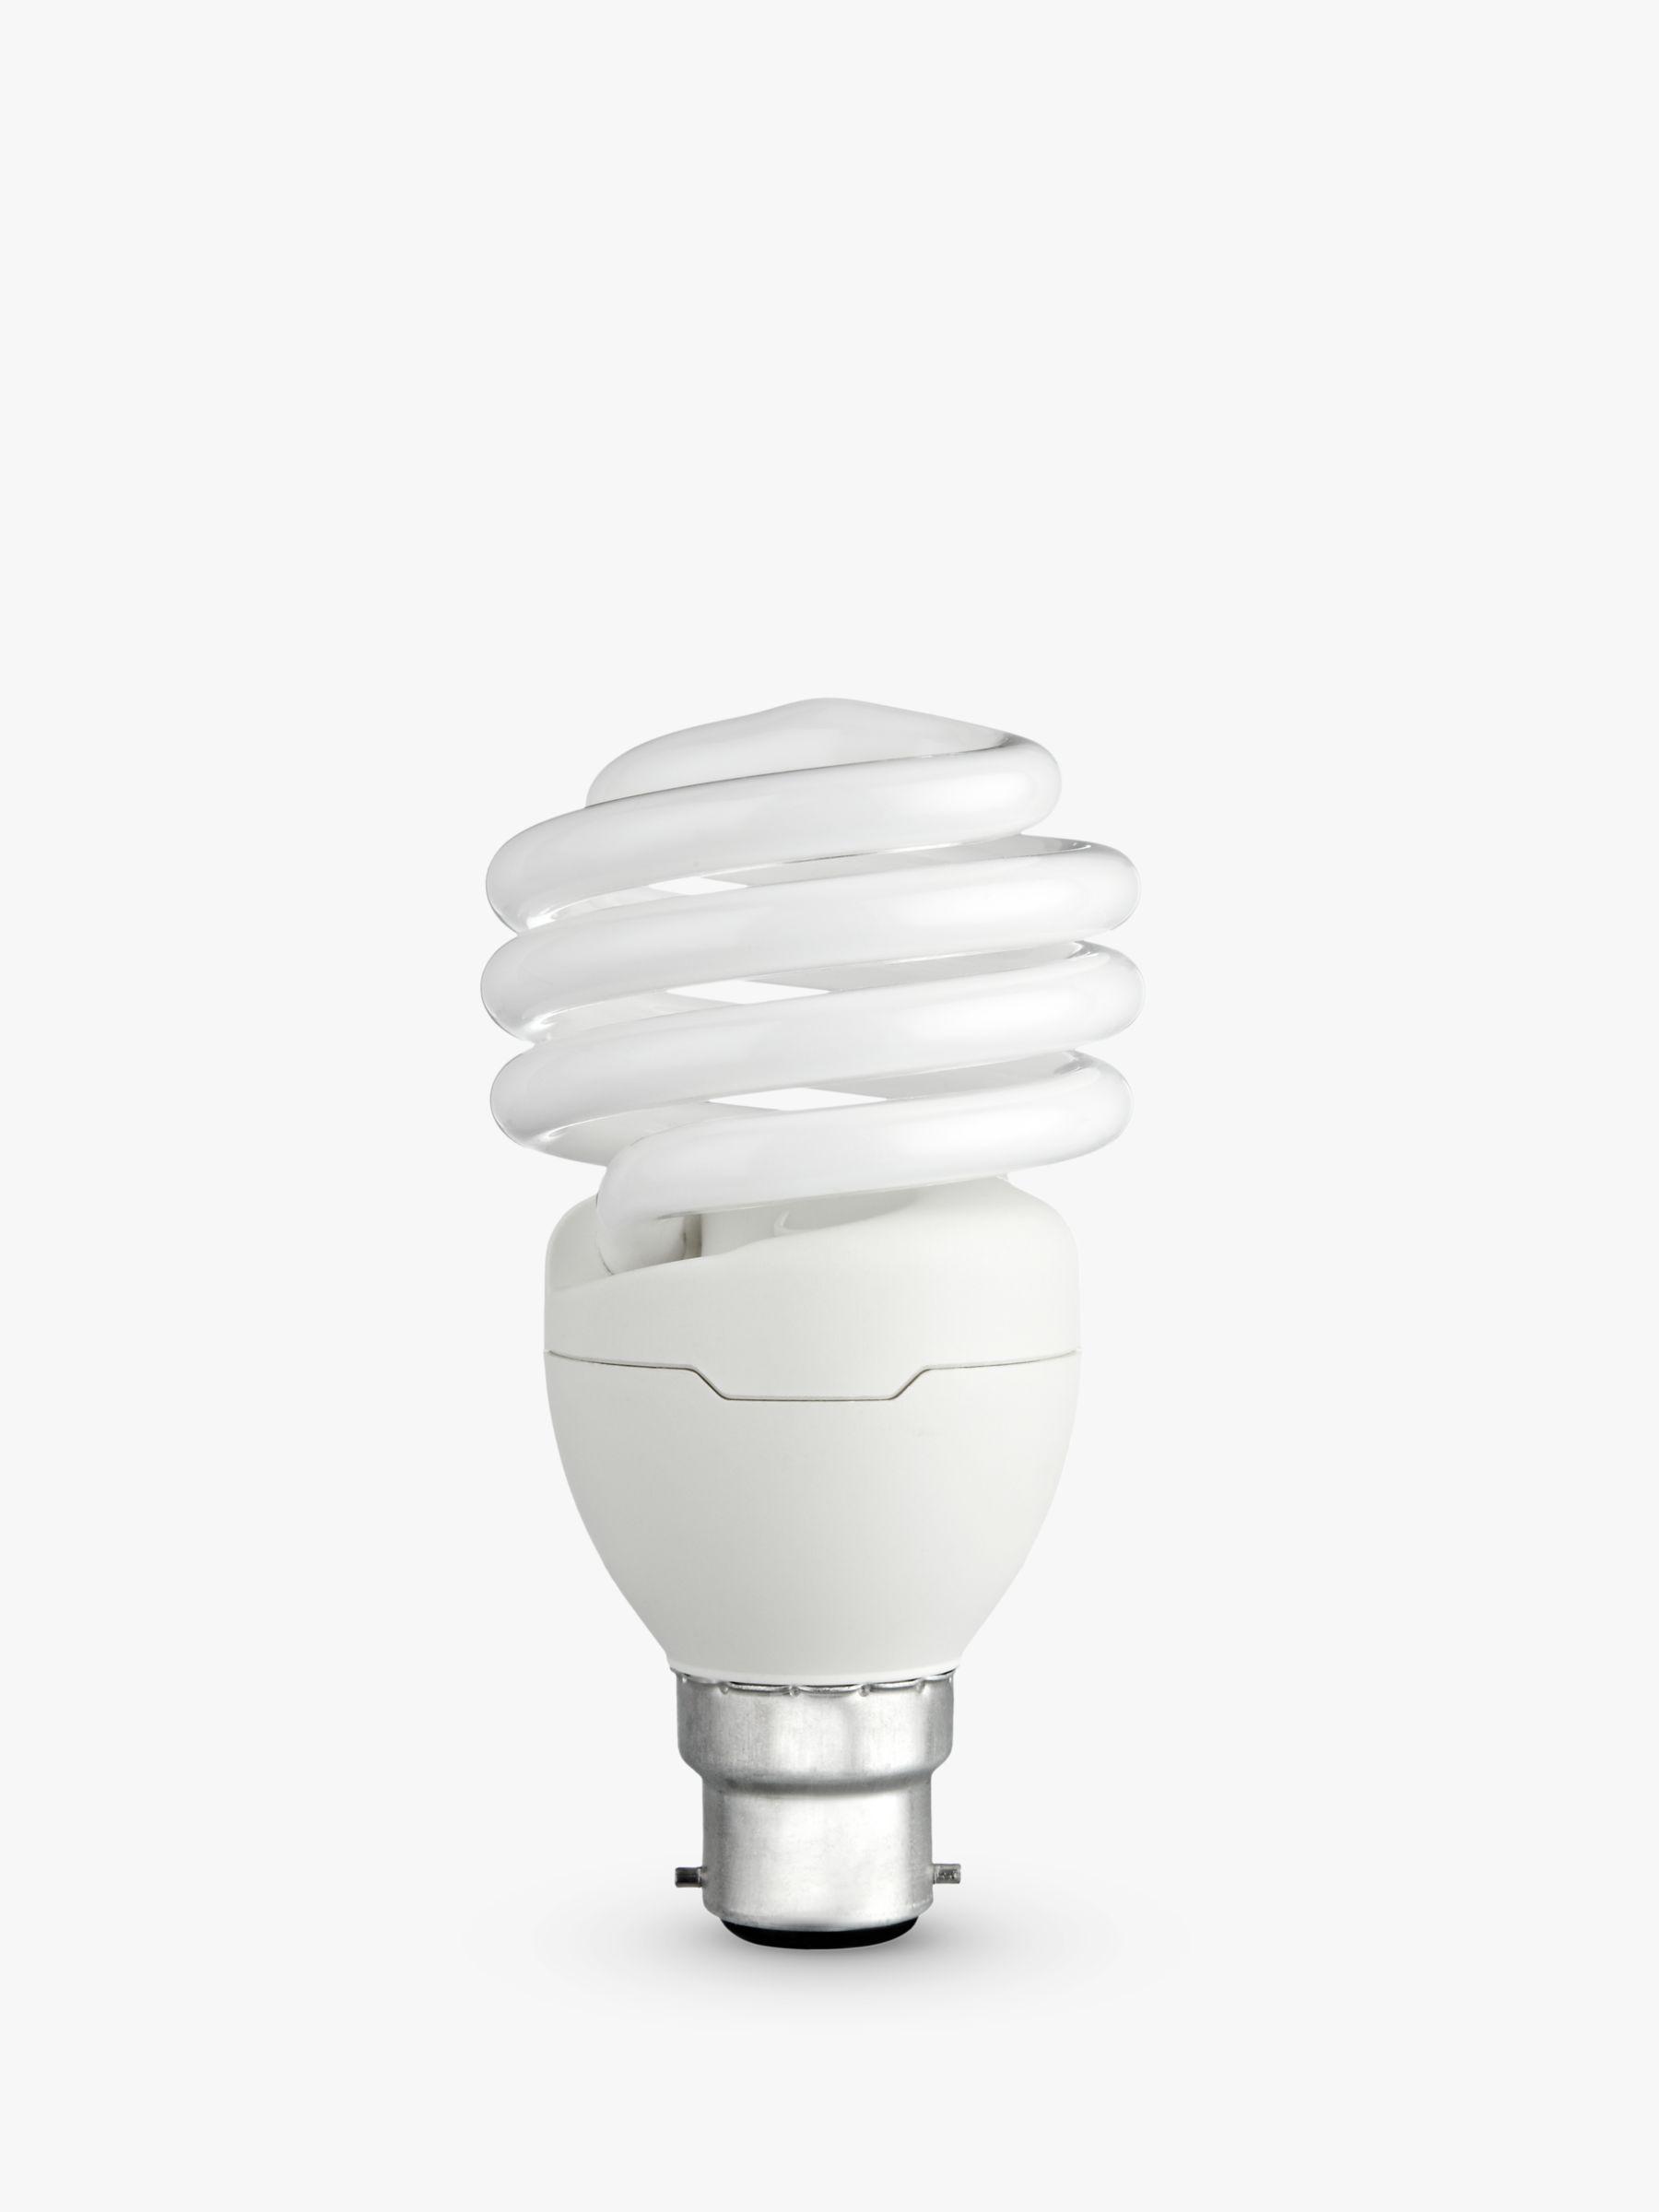 itm ecobulb in watts soft feit electric bulb bulbs lighting cfl white lumens light l